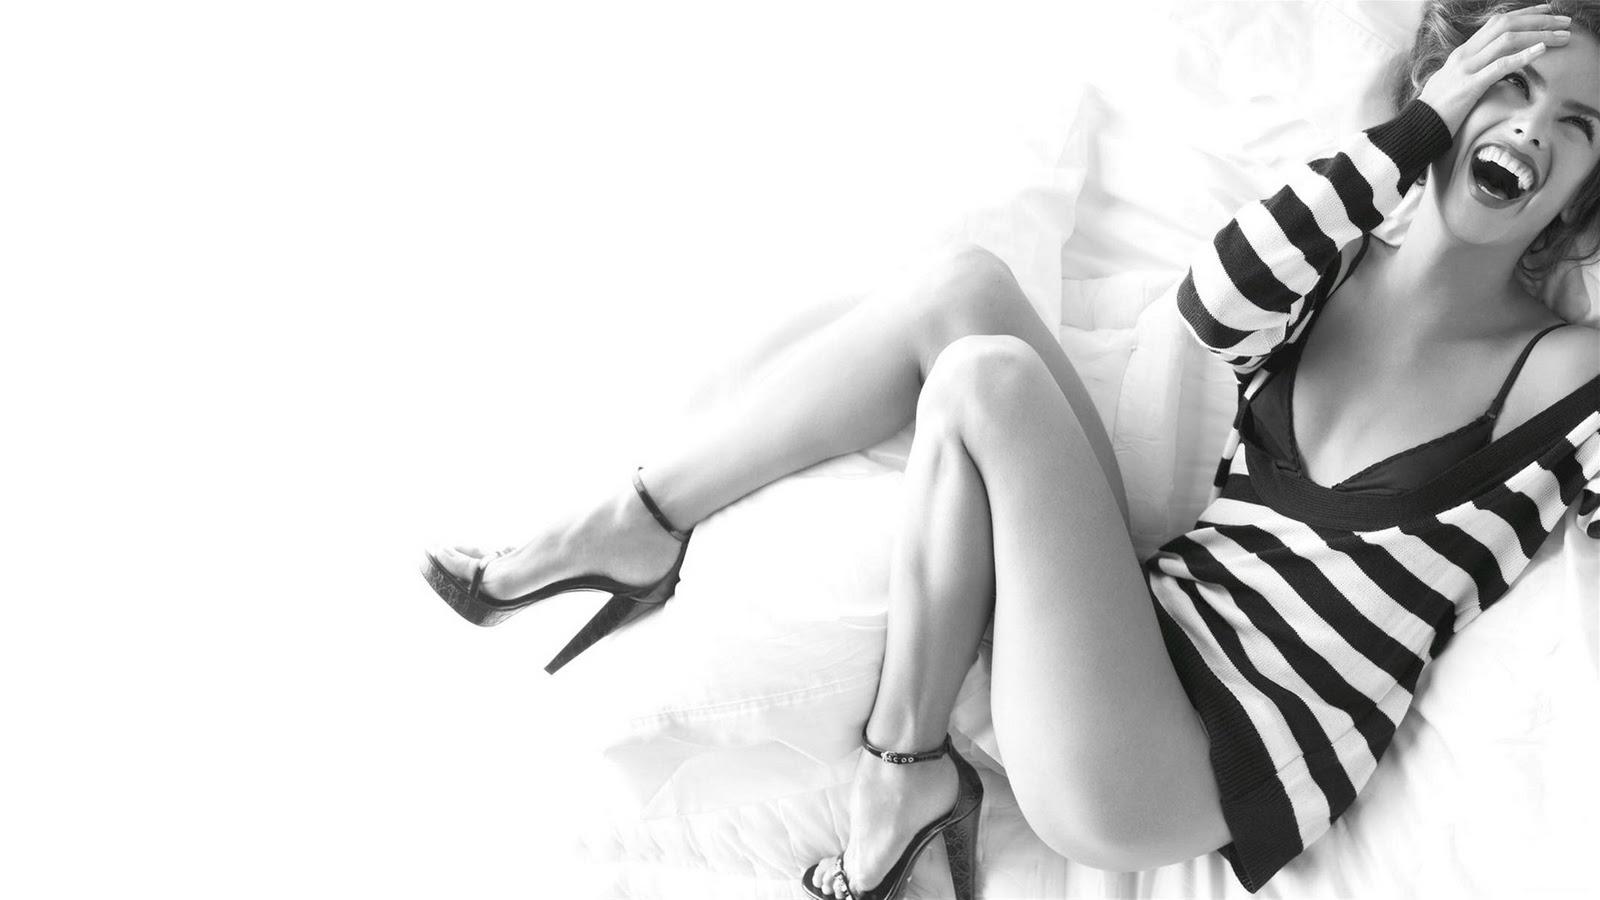 Alessandra Ambrosio Wallpaper - HD Wallpapers